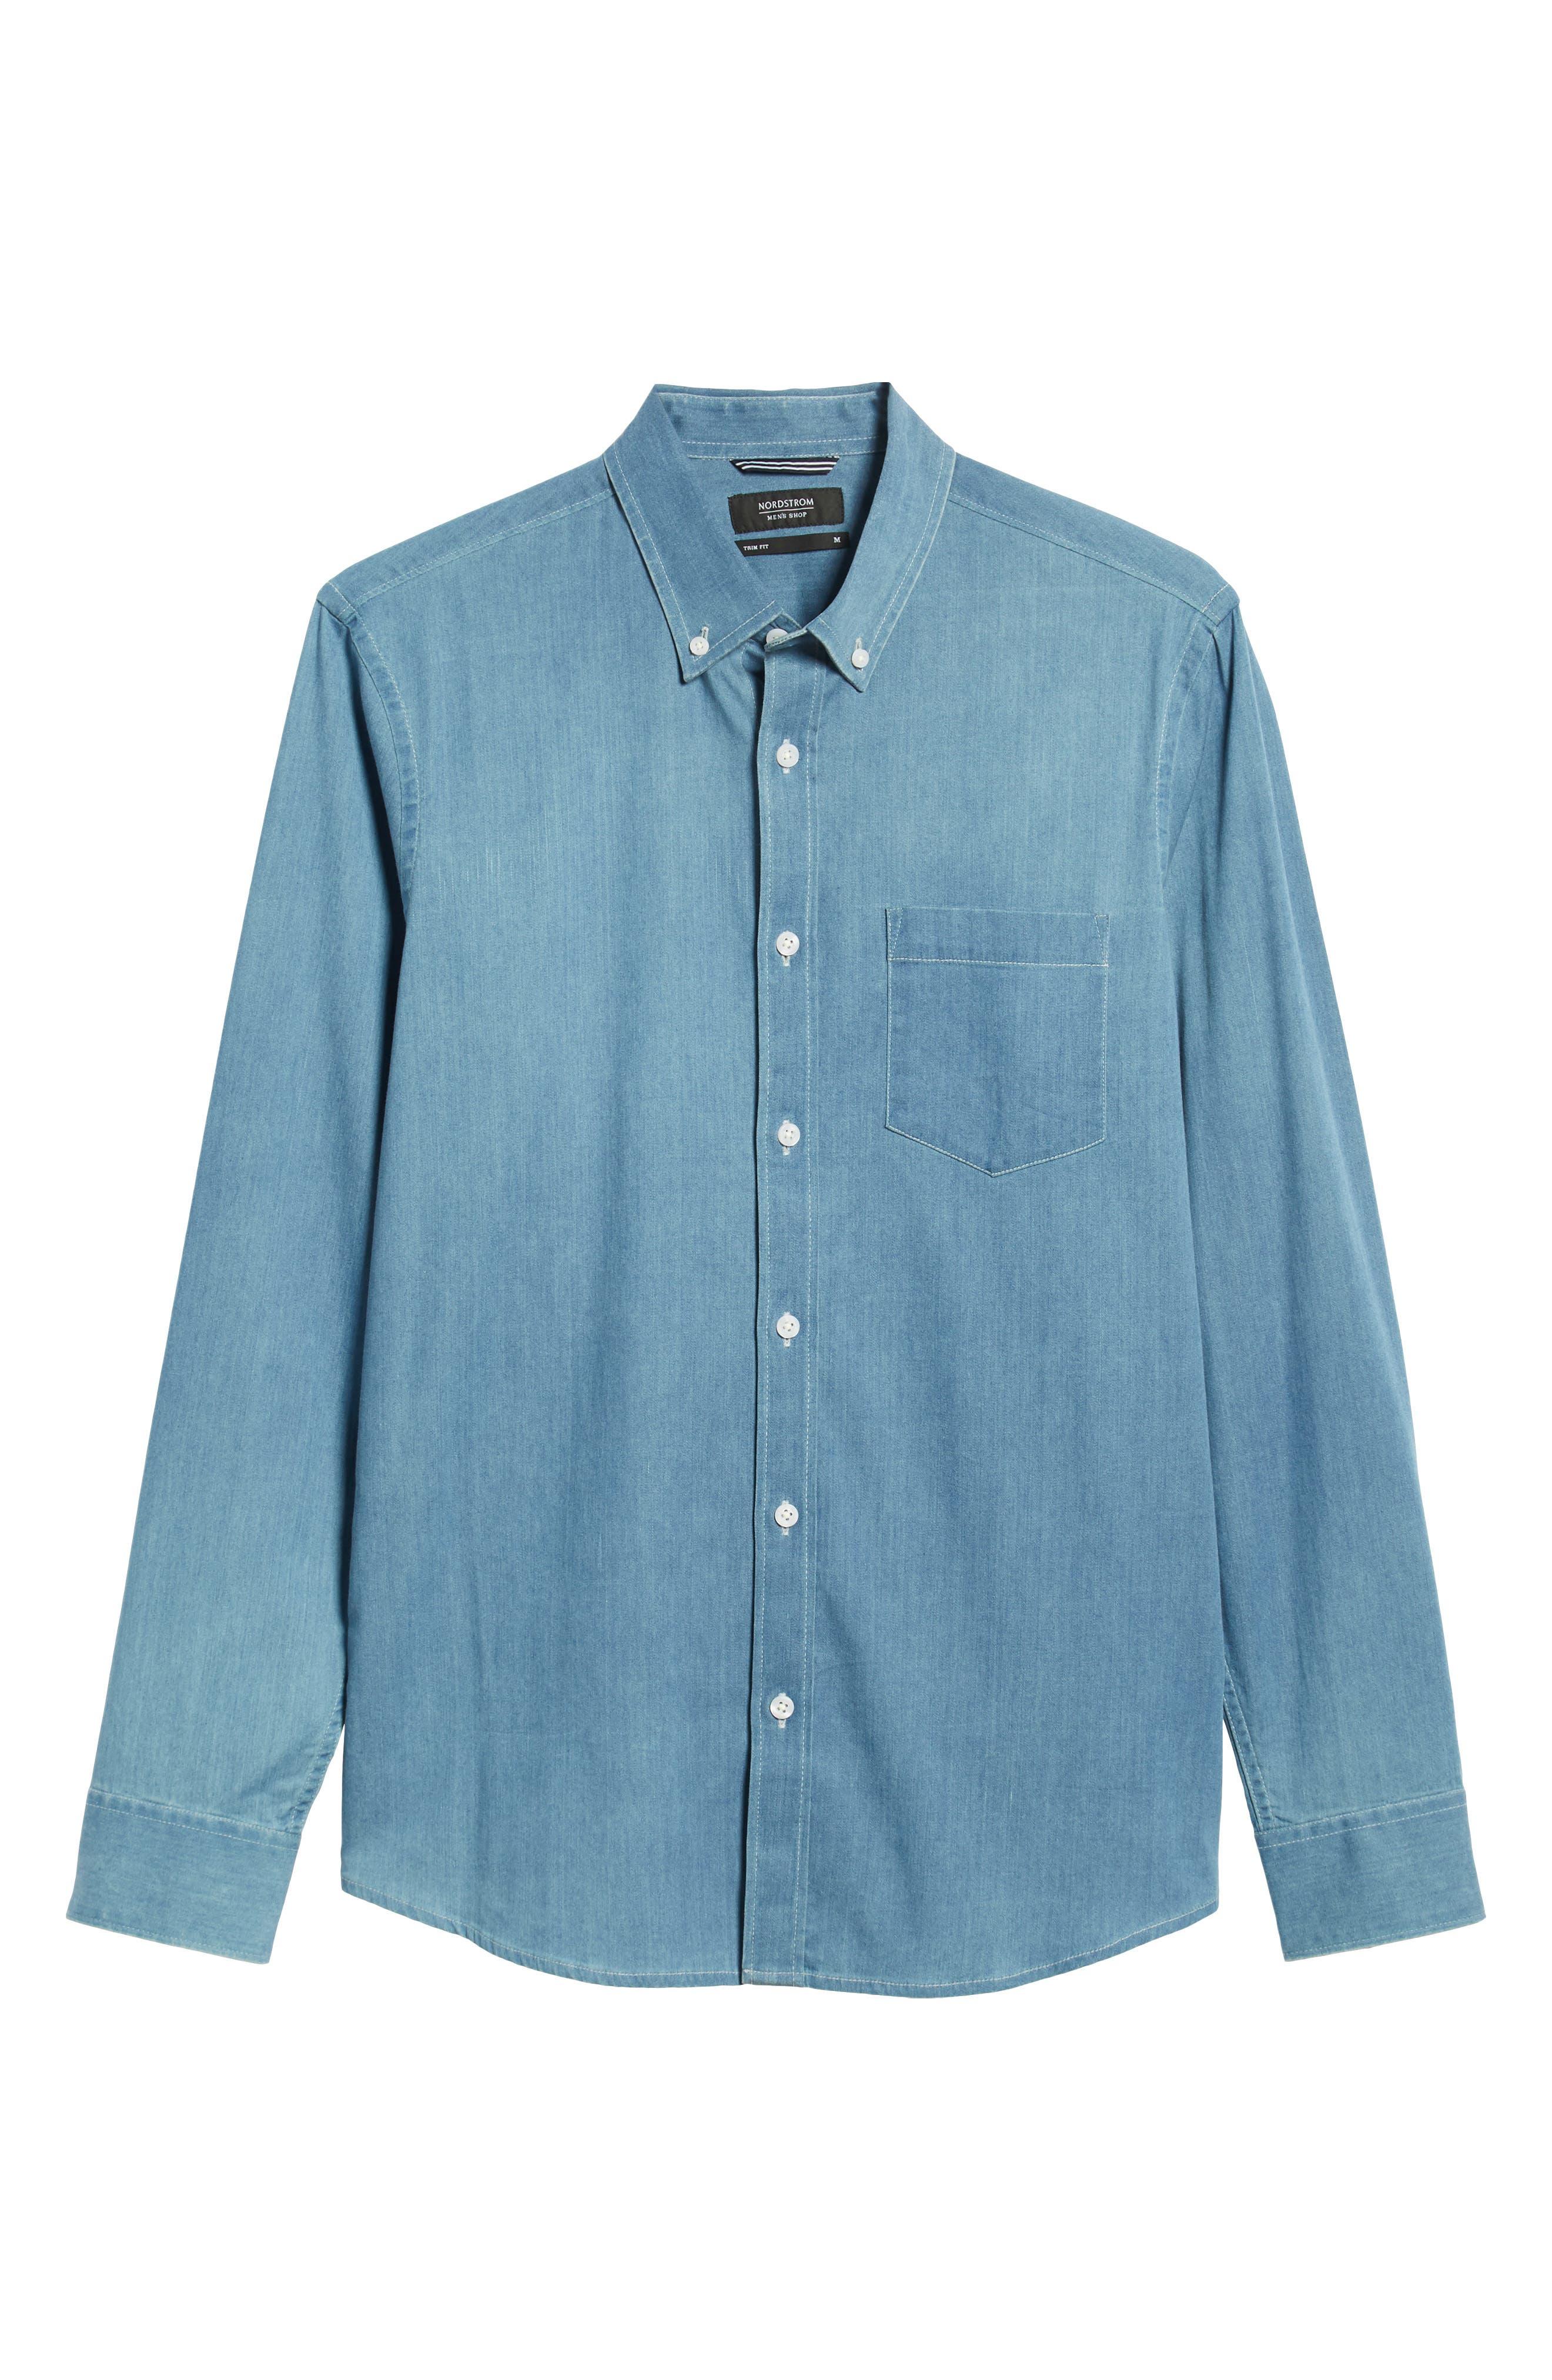 Slim Fit Chambray Sport Shirt,                             Alternate thumbnail 5, color,                             BLUE HEAVEN CHAMBRAY